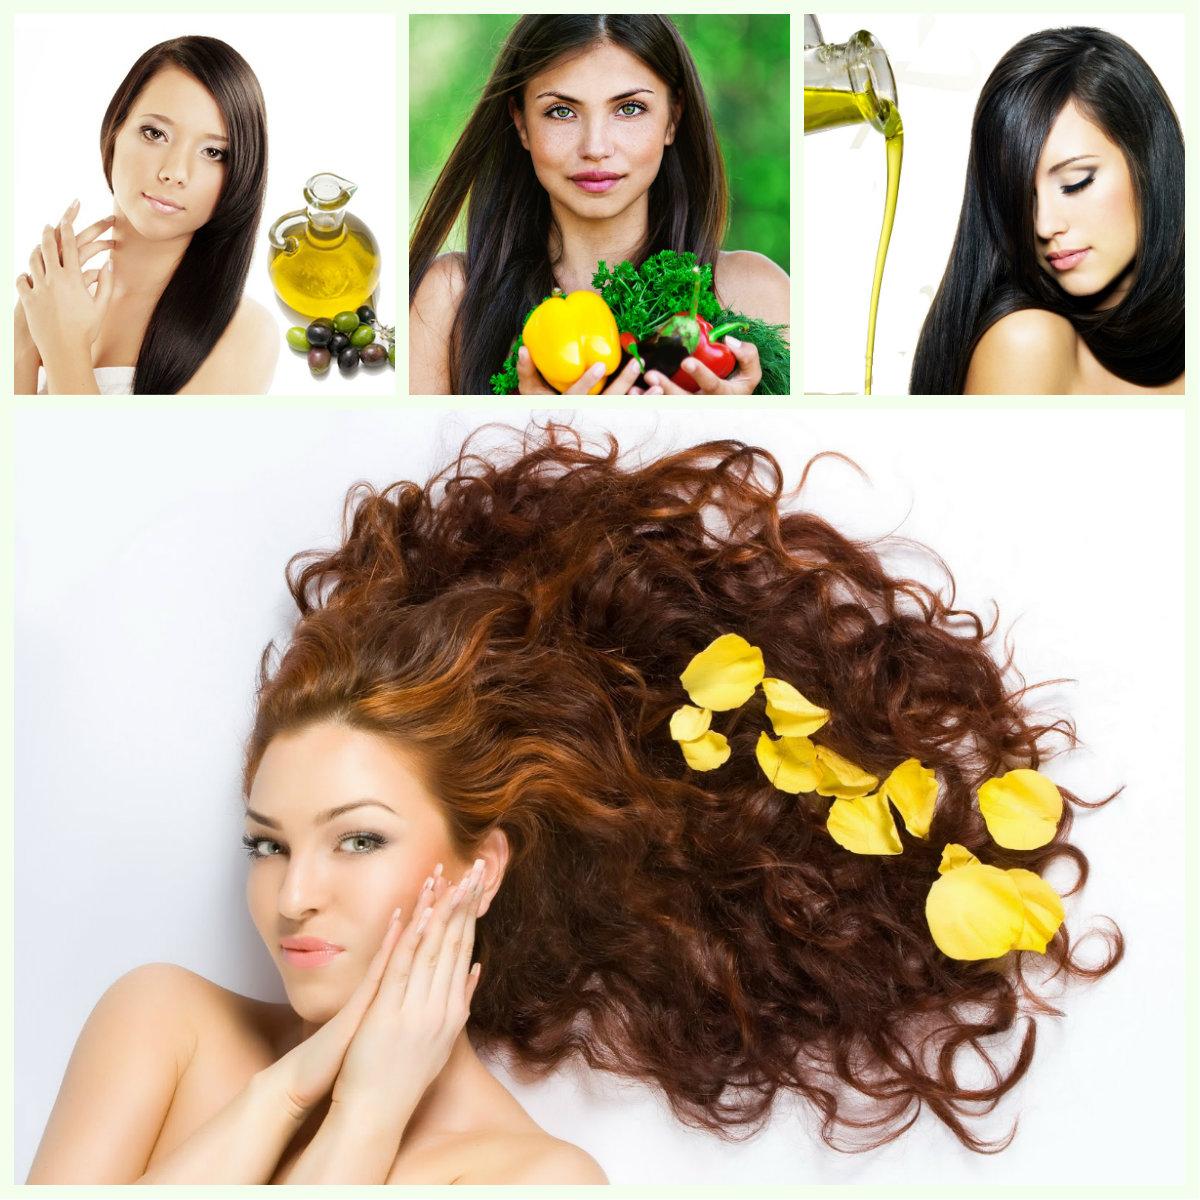 Лосьон абелла останавливающий рост волос на теле helps Minoxidil penetrate